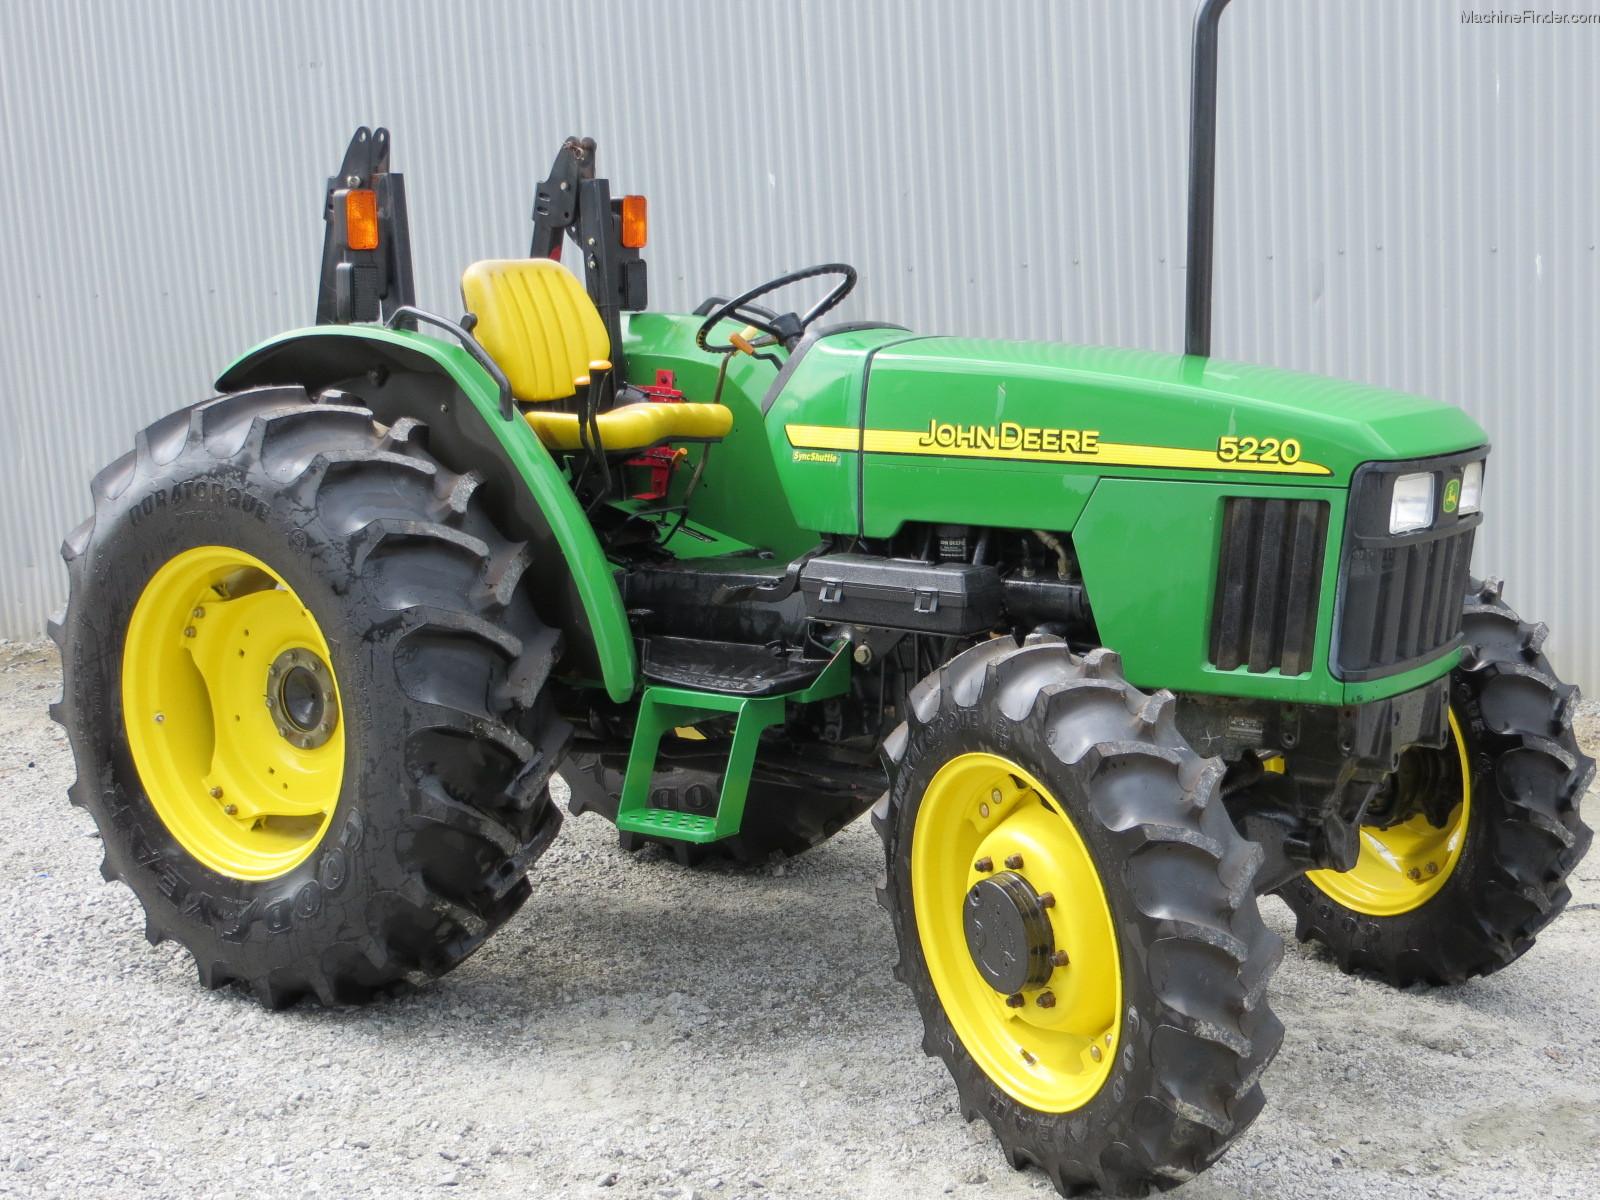 2002 John Deere 5220 Tractors - Utility (40-100hp) - John ...